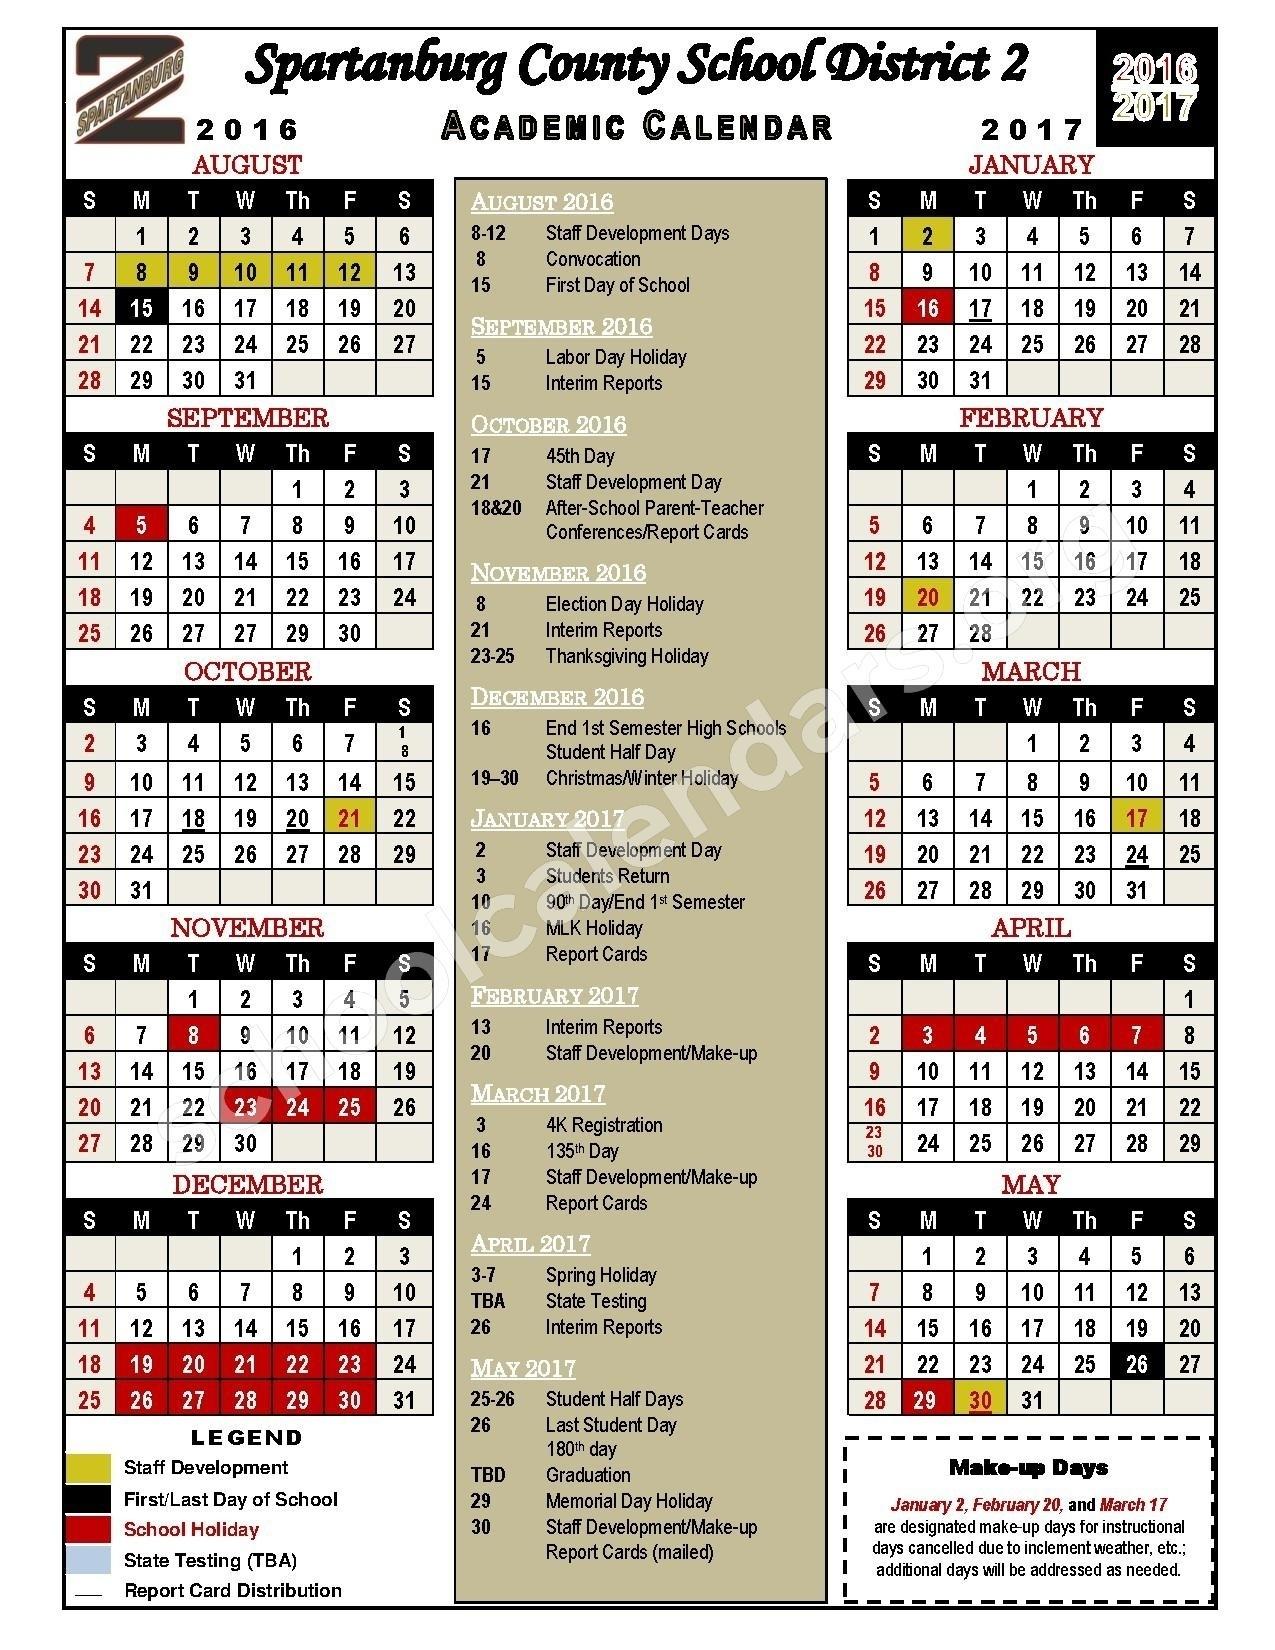 Dashing Spart 1 School Calendar • Printable Blank Calendar Template_Spart 1 School Calendar